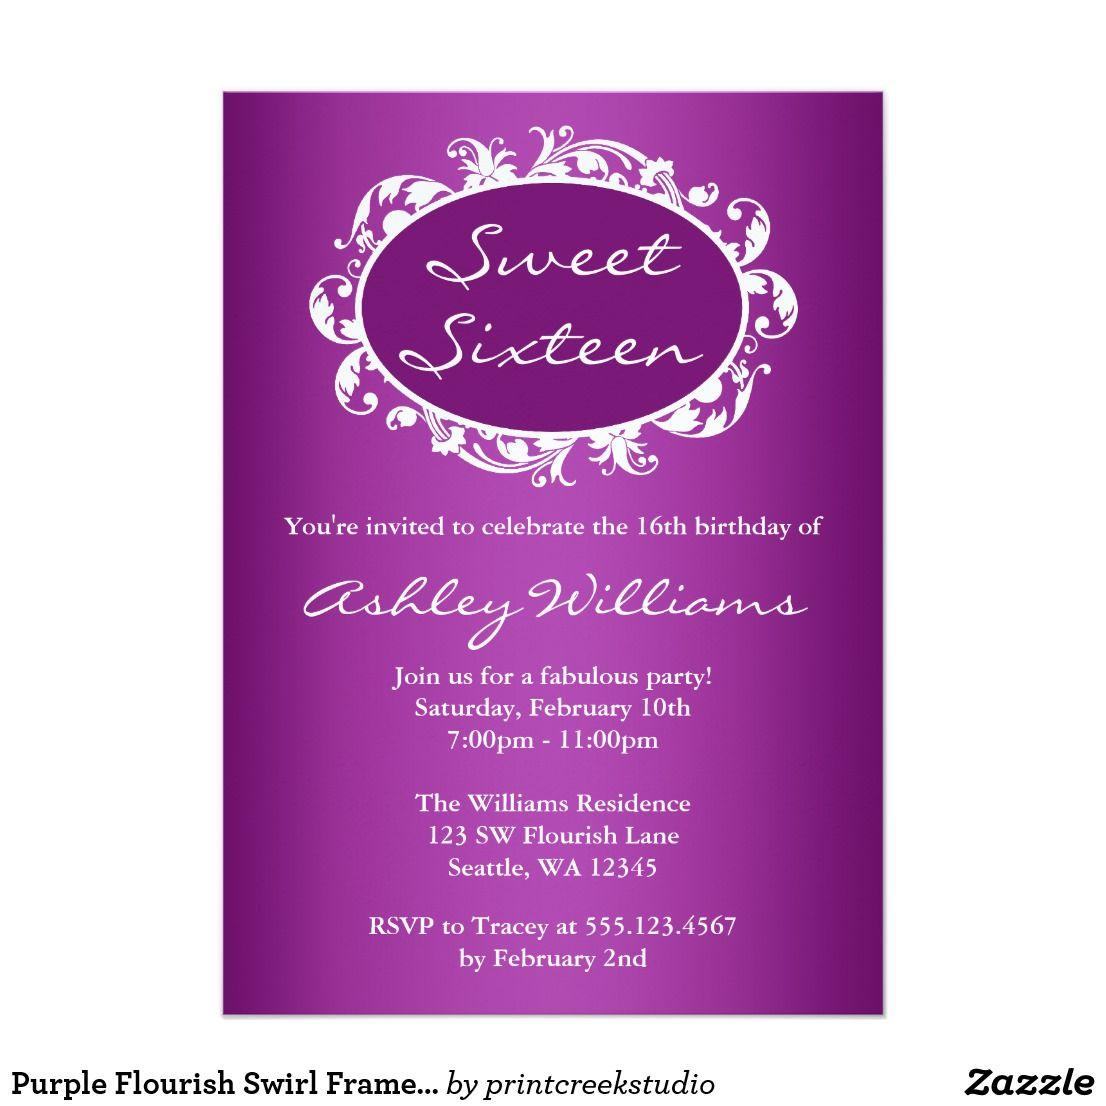 Purple flourish swirl frame sweet 16 birthday card invitation purple flourish swirl frame sweet 16 birthday card bookmarktalkfo Choice Image